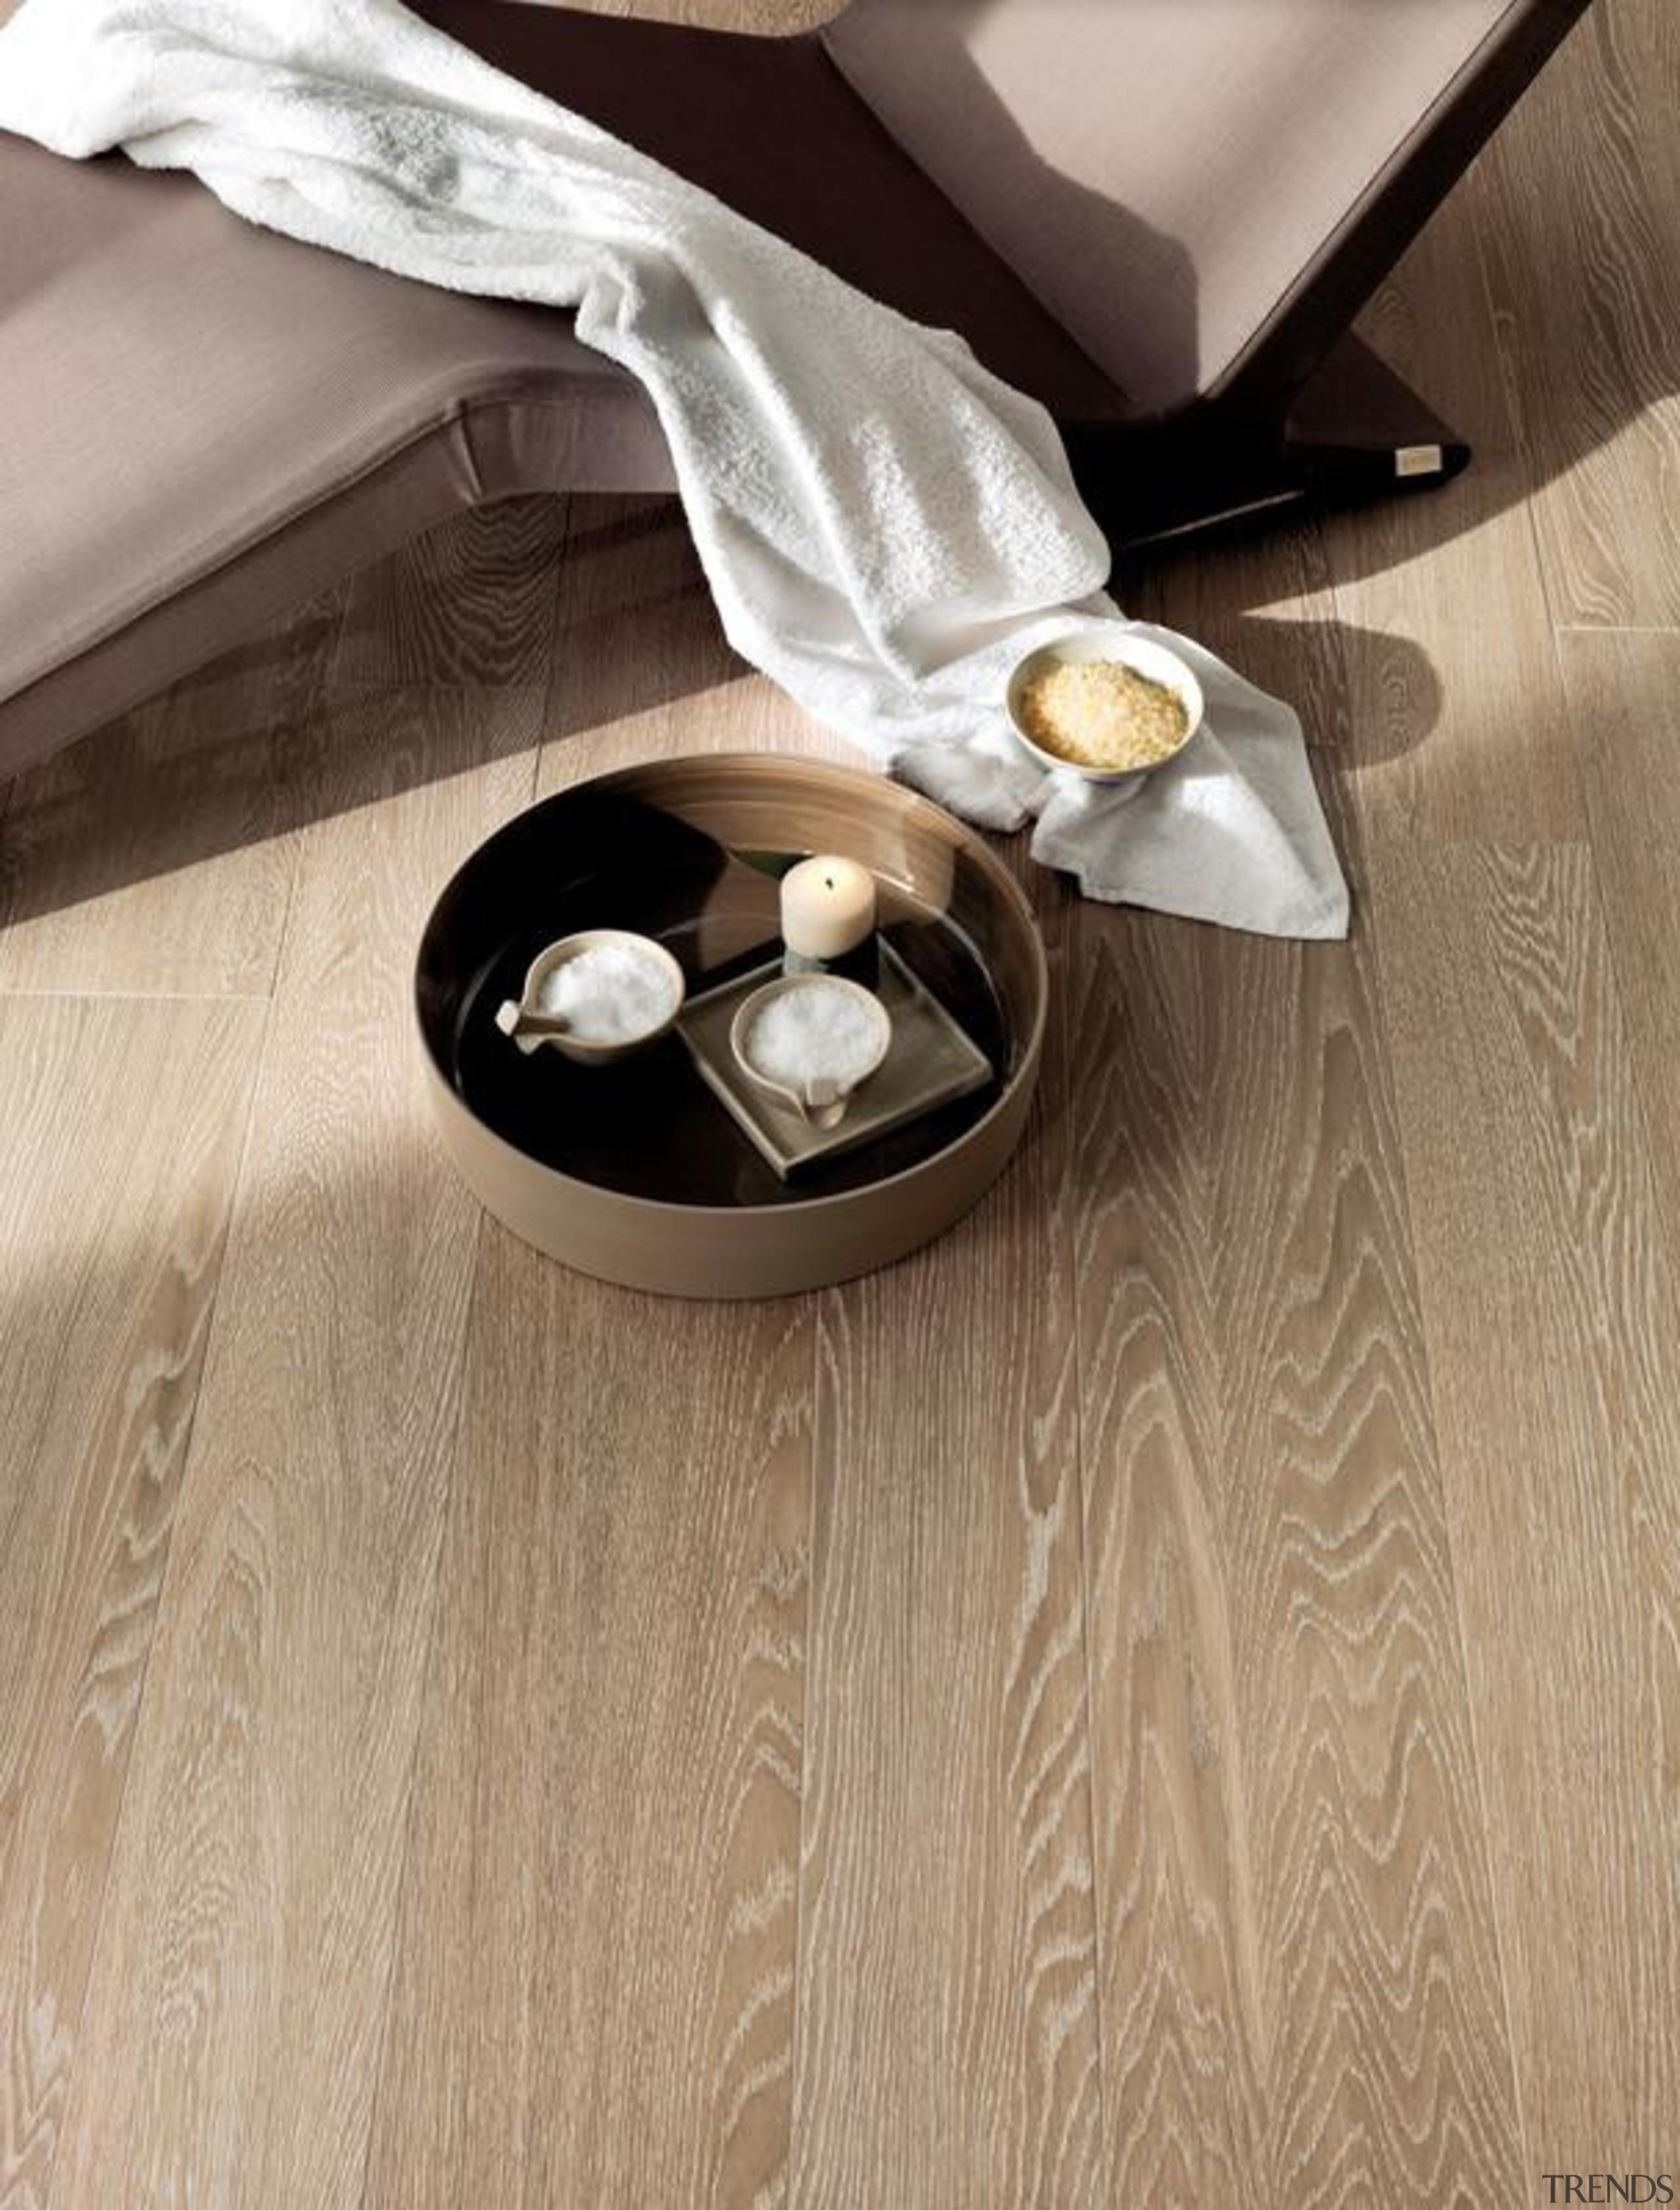 Bioplank noisette interior living room wood look floor floor, flooring, product design, table, brown, gray